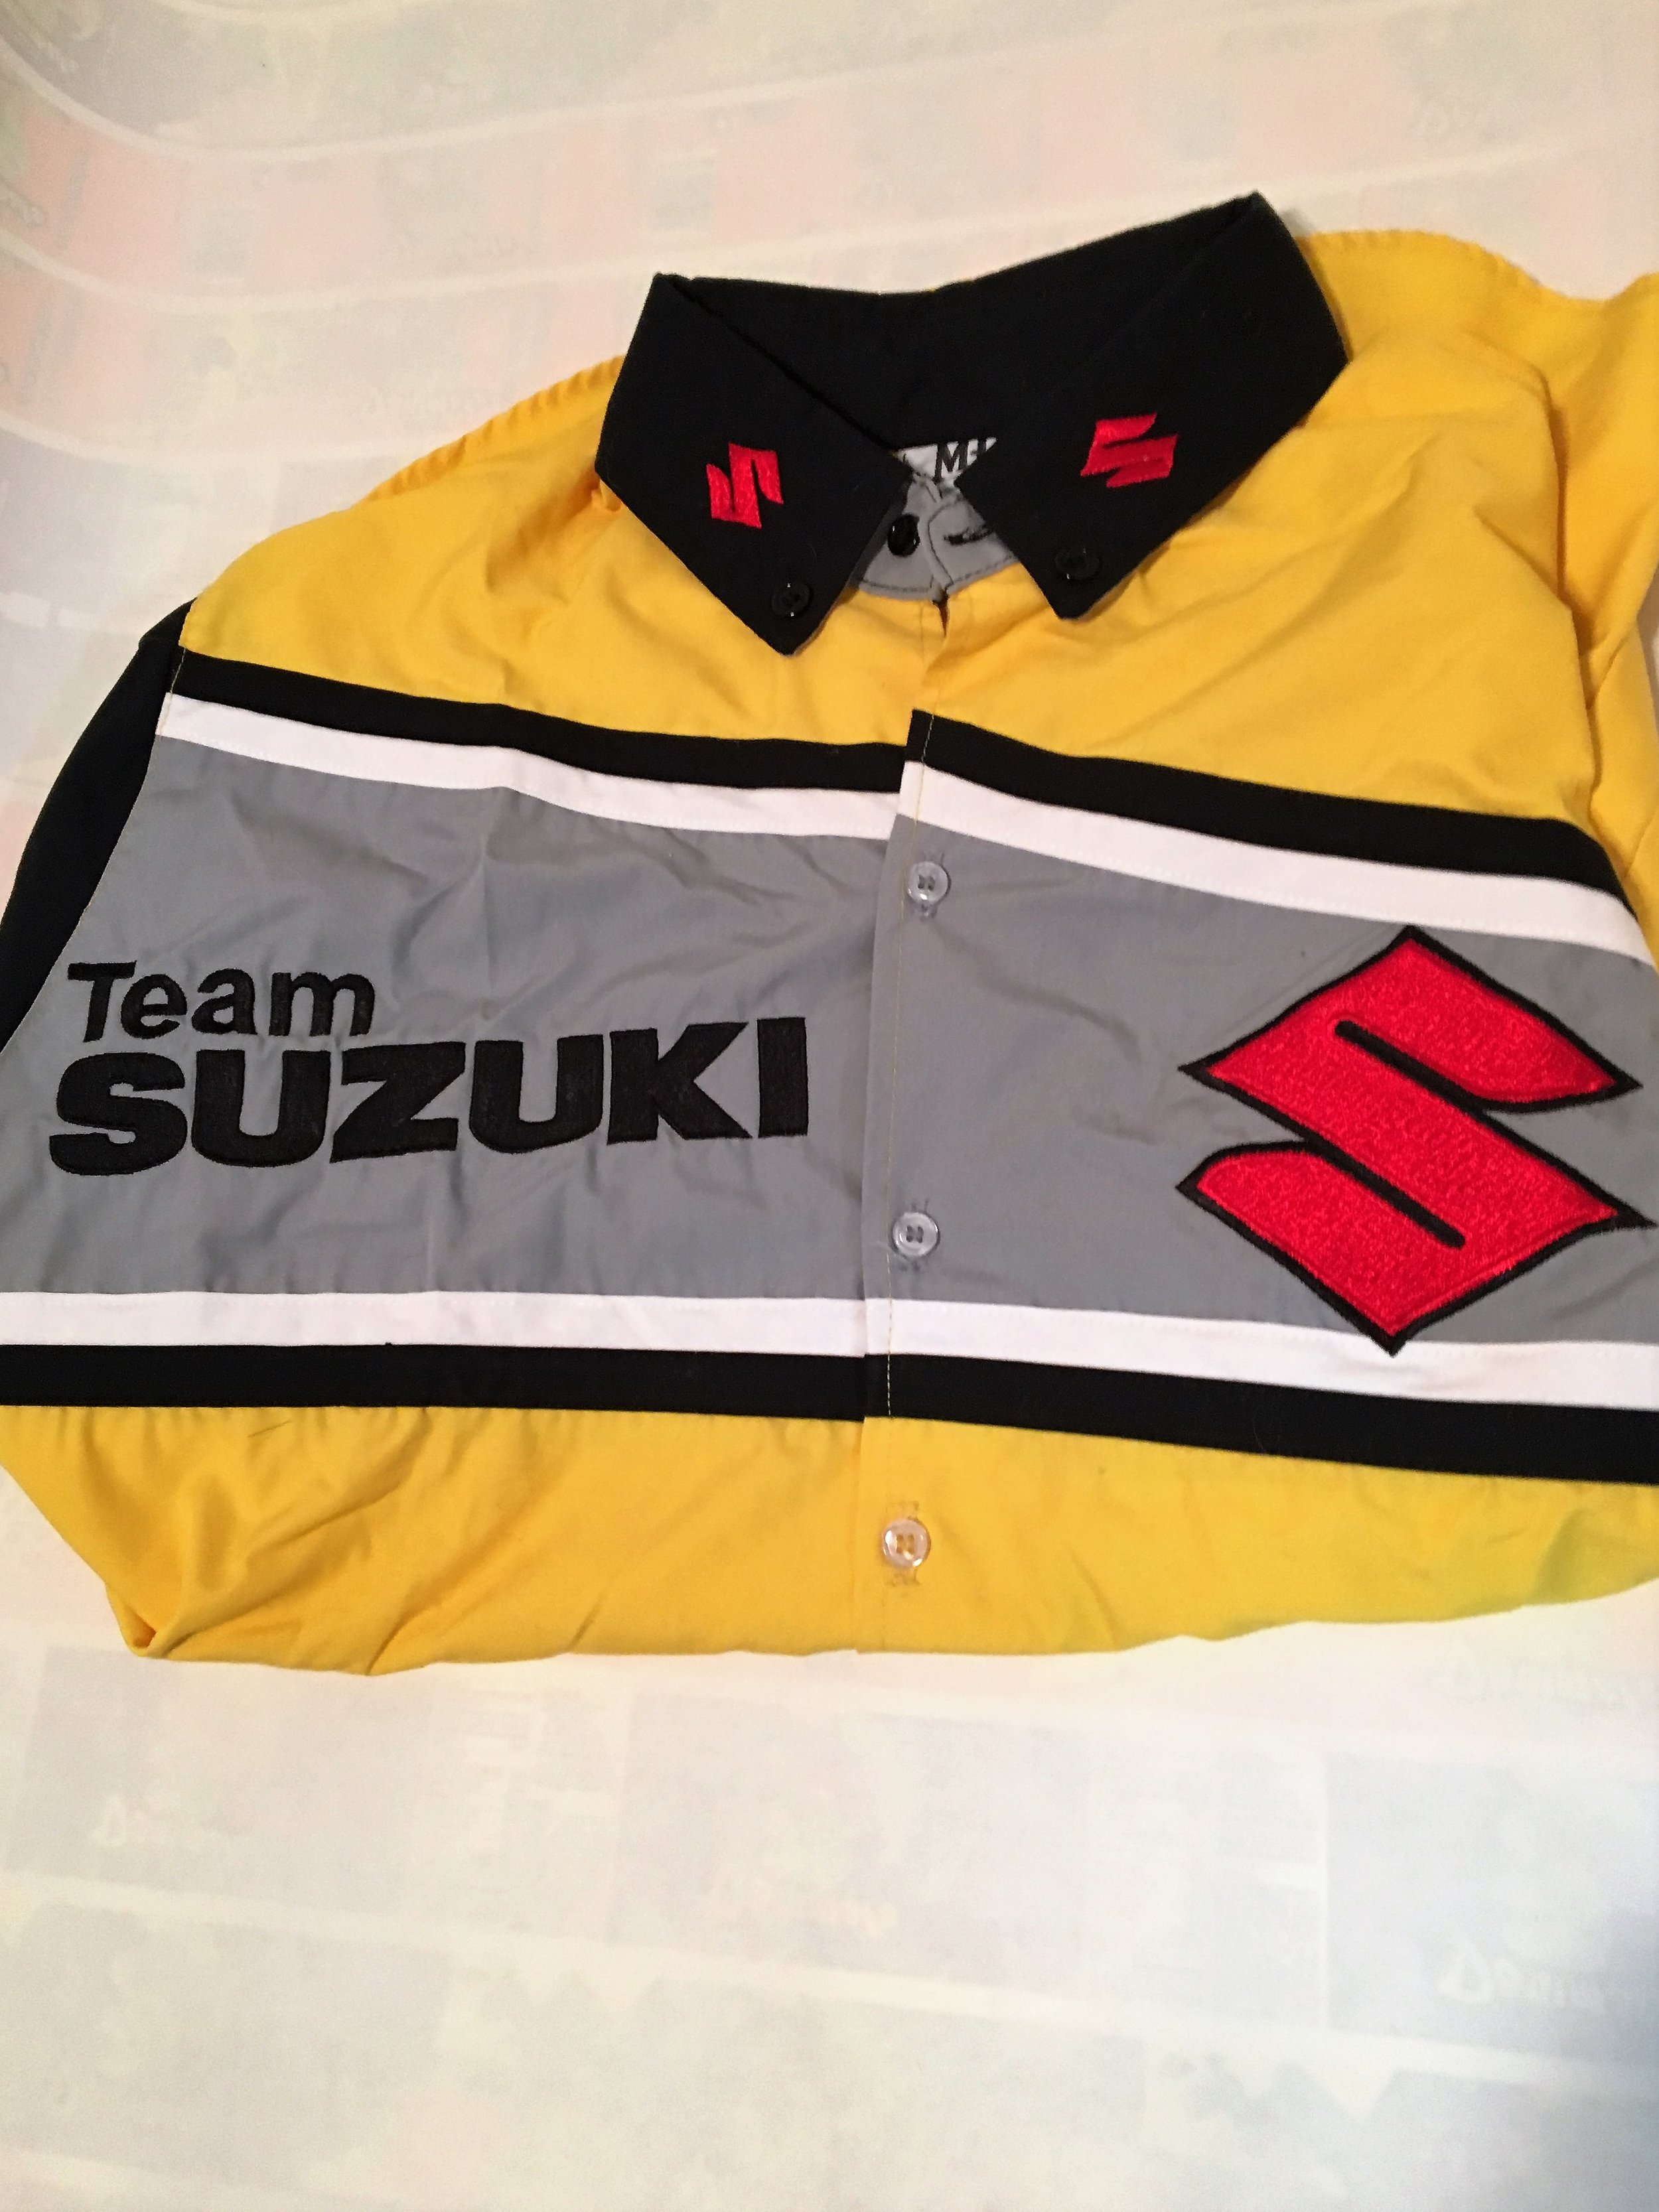 Suzuki Crew Shirt $25